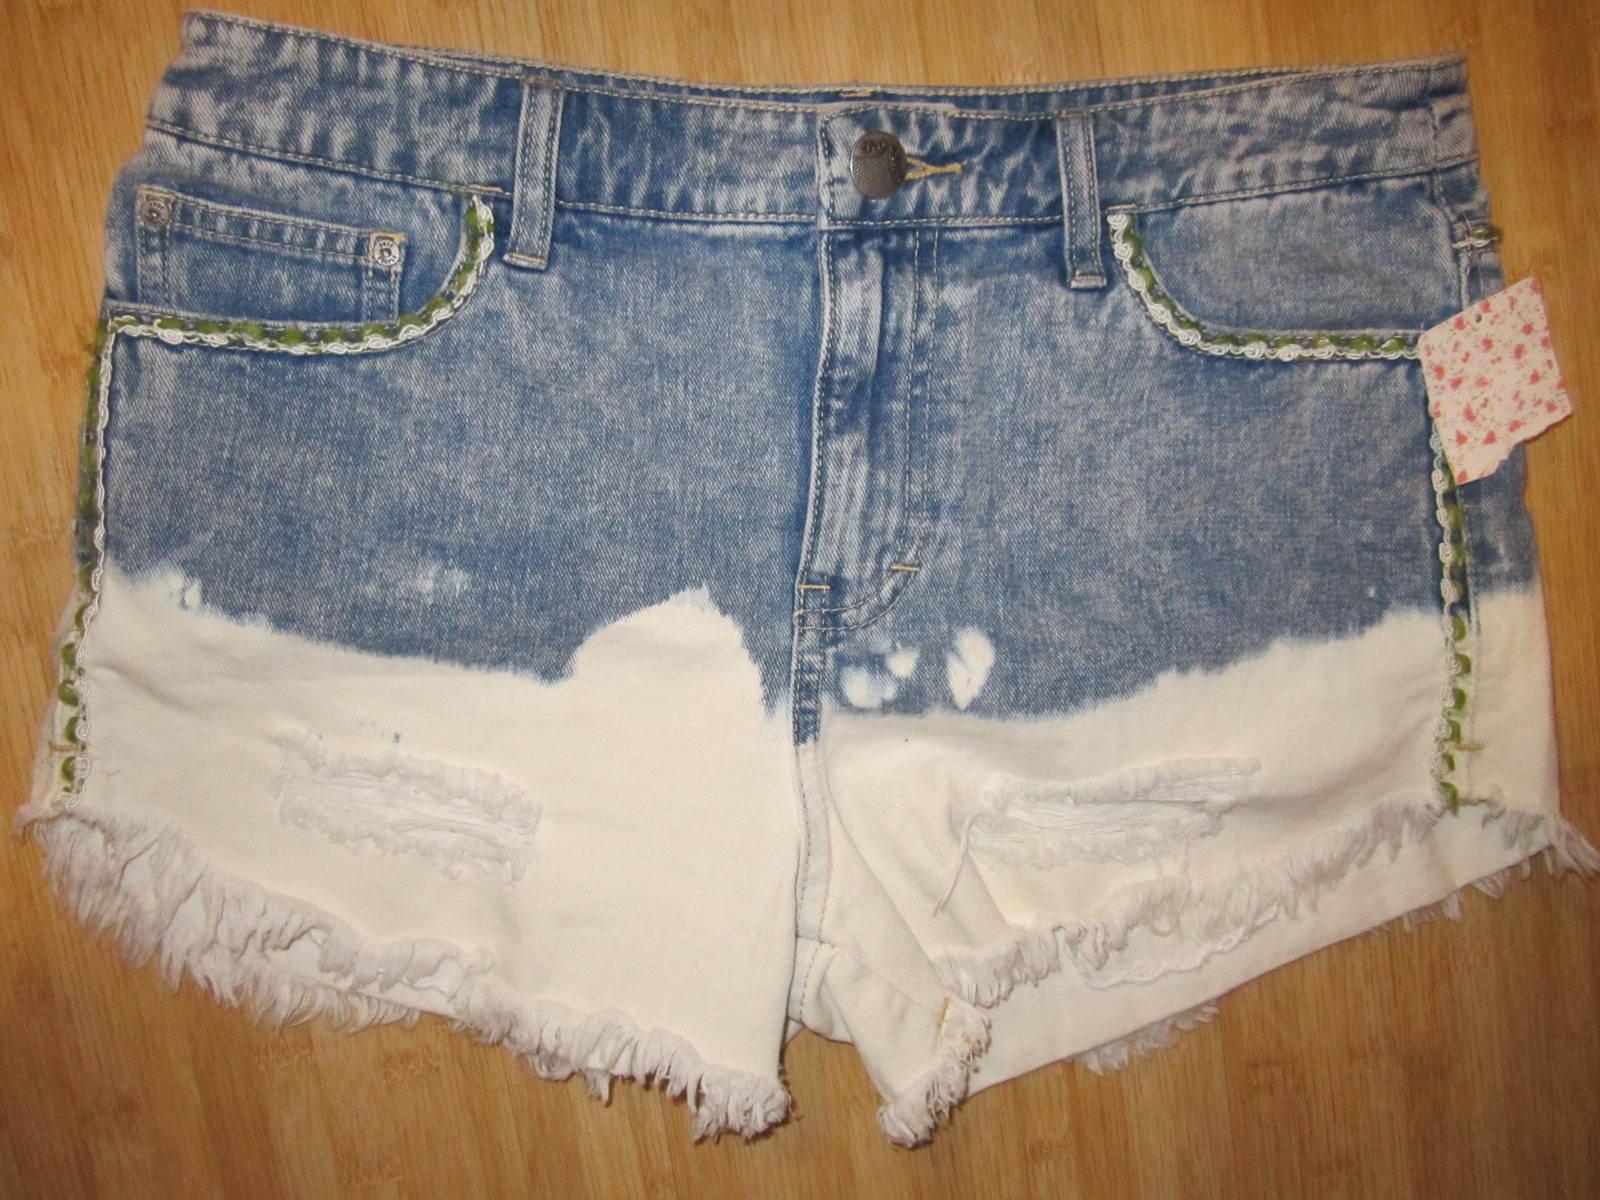 EUC Free People 24 JEAN DENIM Shorts PANTS Distressed Cut Offs Floral Detail blue